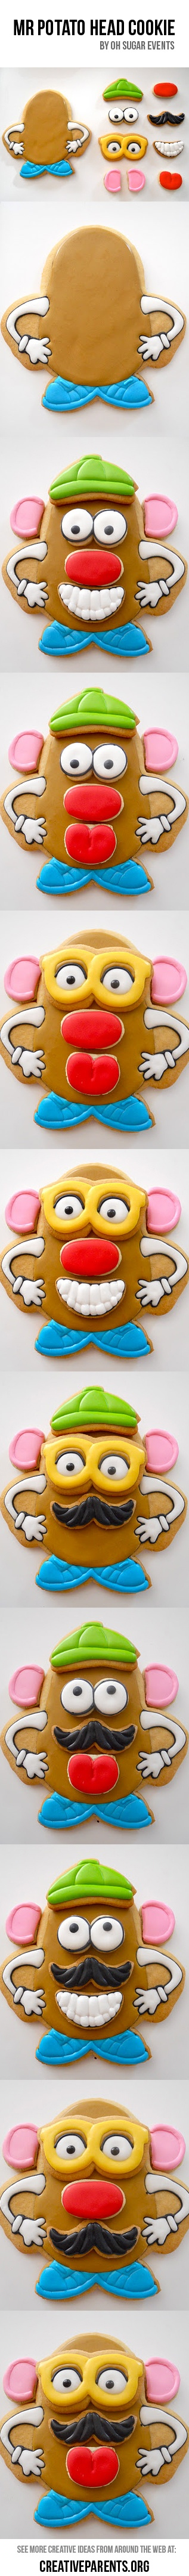 Mr. Potato Head Cookie - Creative ideas from around the web. http://creativeparents.org